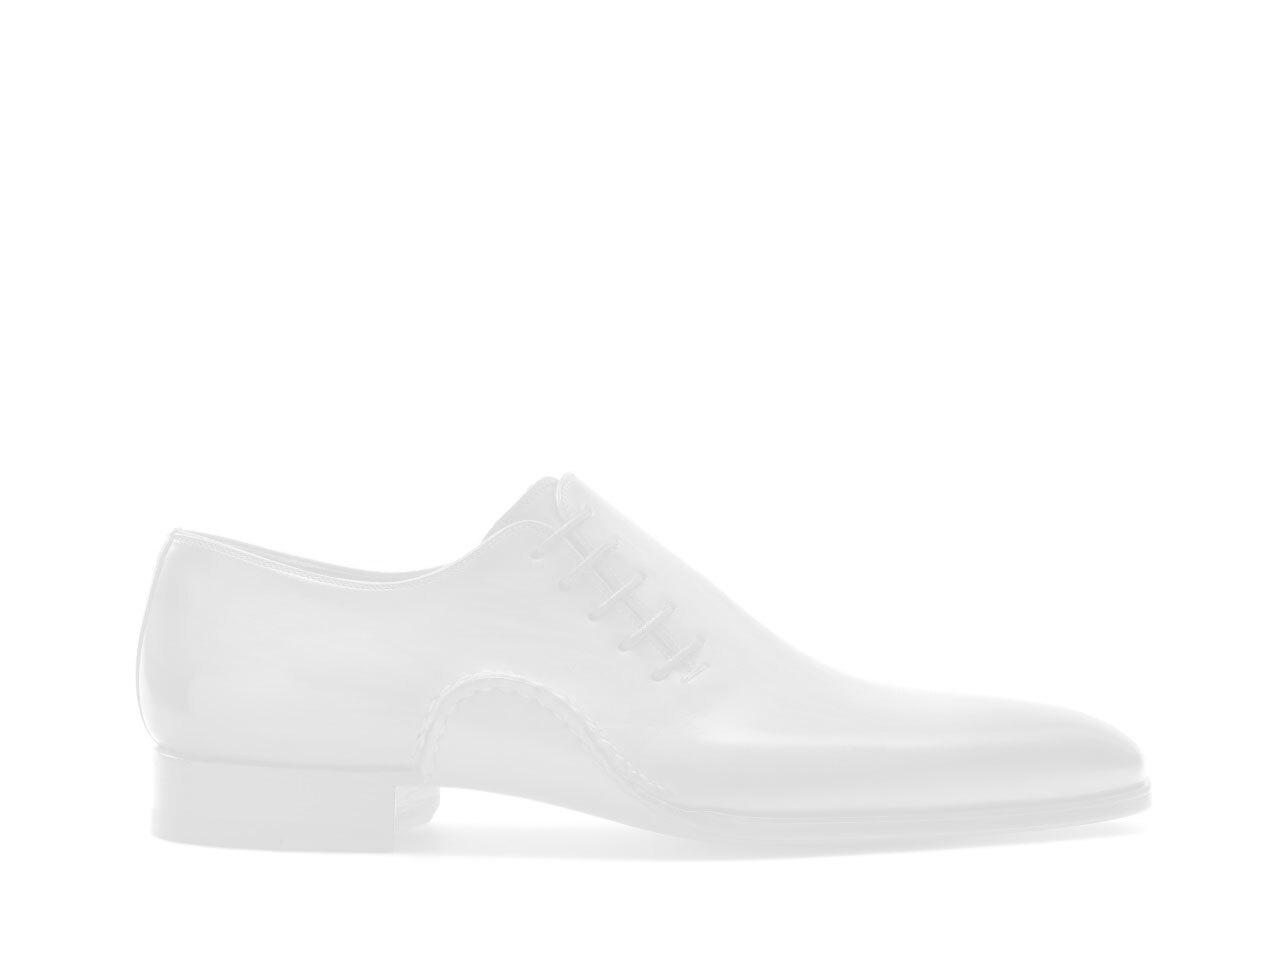 Pair of the Magnanni Gasol Black Men's Sneakers